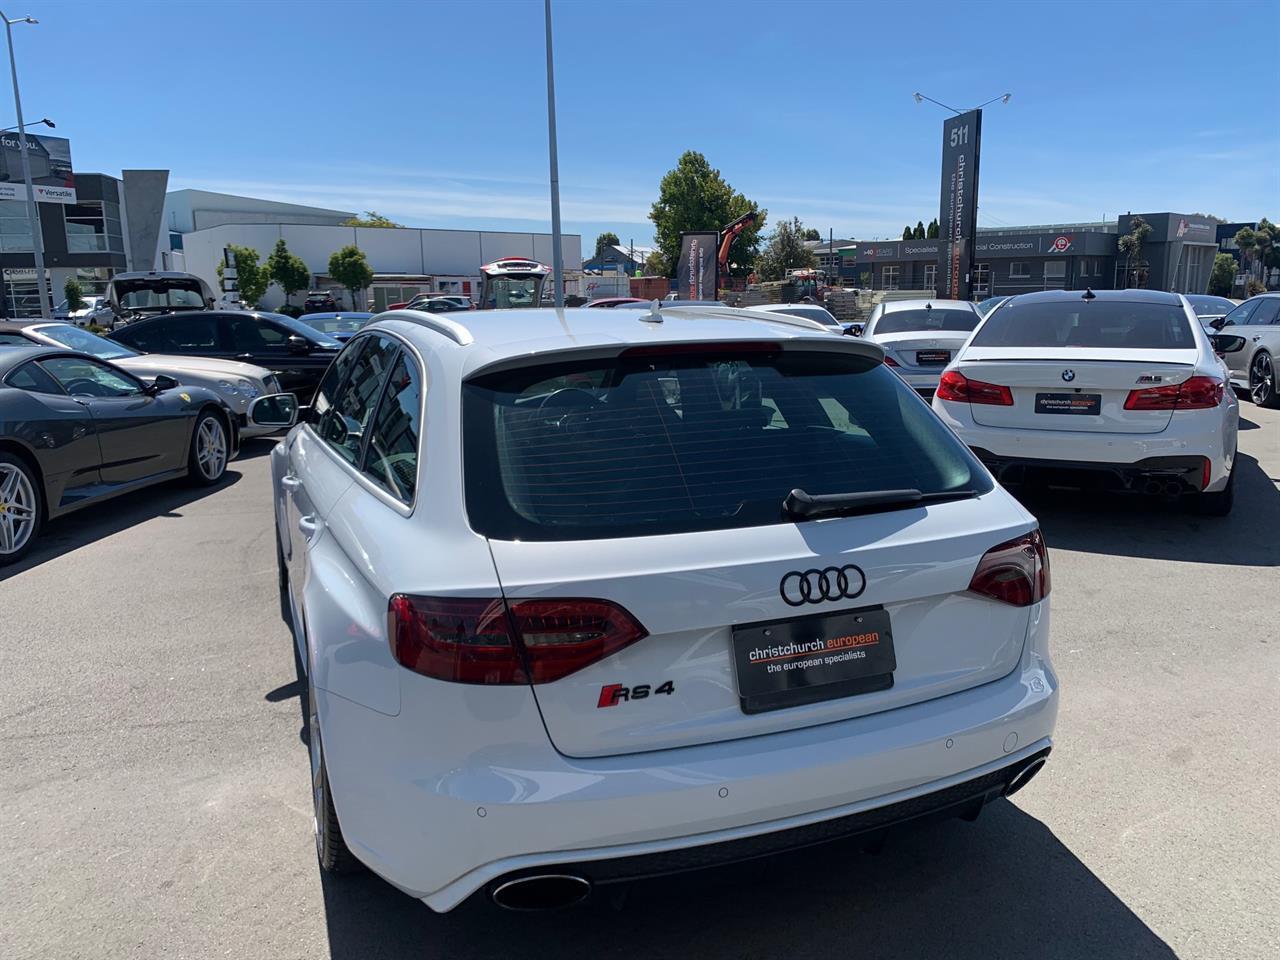 image-3, 2013 Audi RS4 4.2 V8 Quattro FSI Wagon at Christchurch